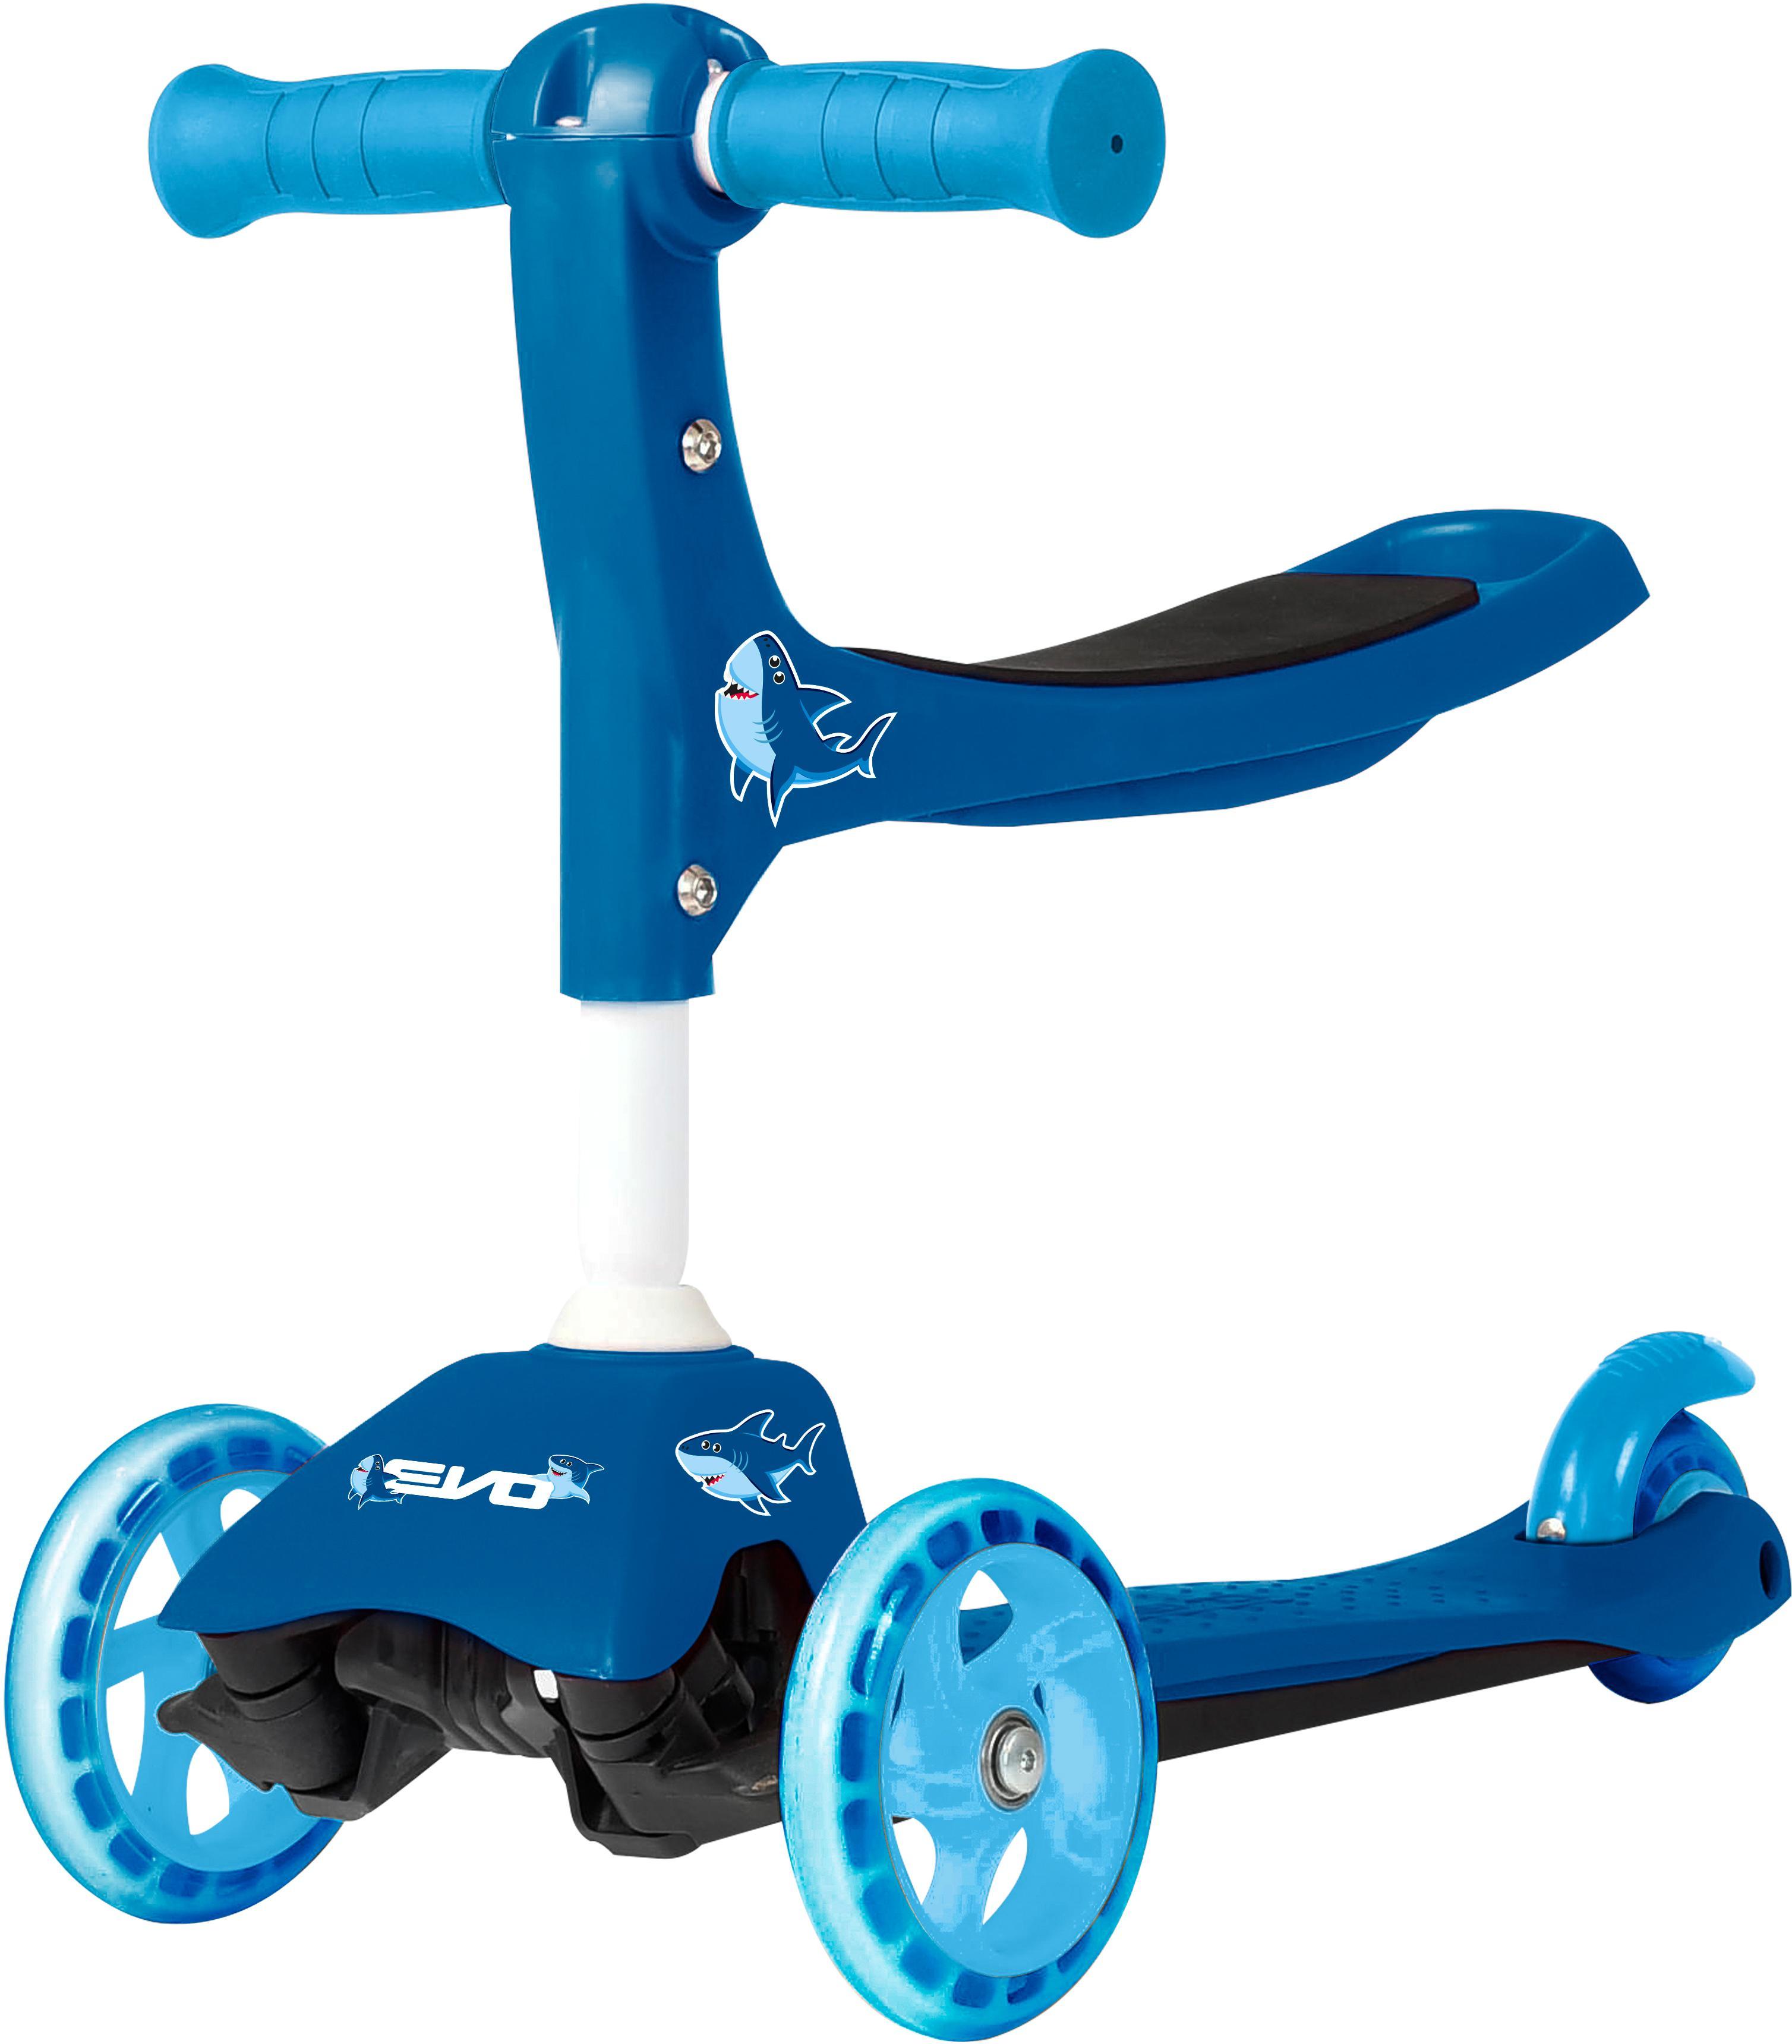 Evo+ 3-In-1 Kids Scooter - Blue Shark